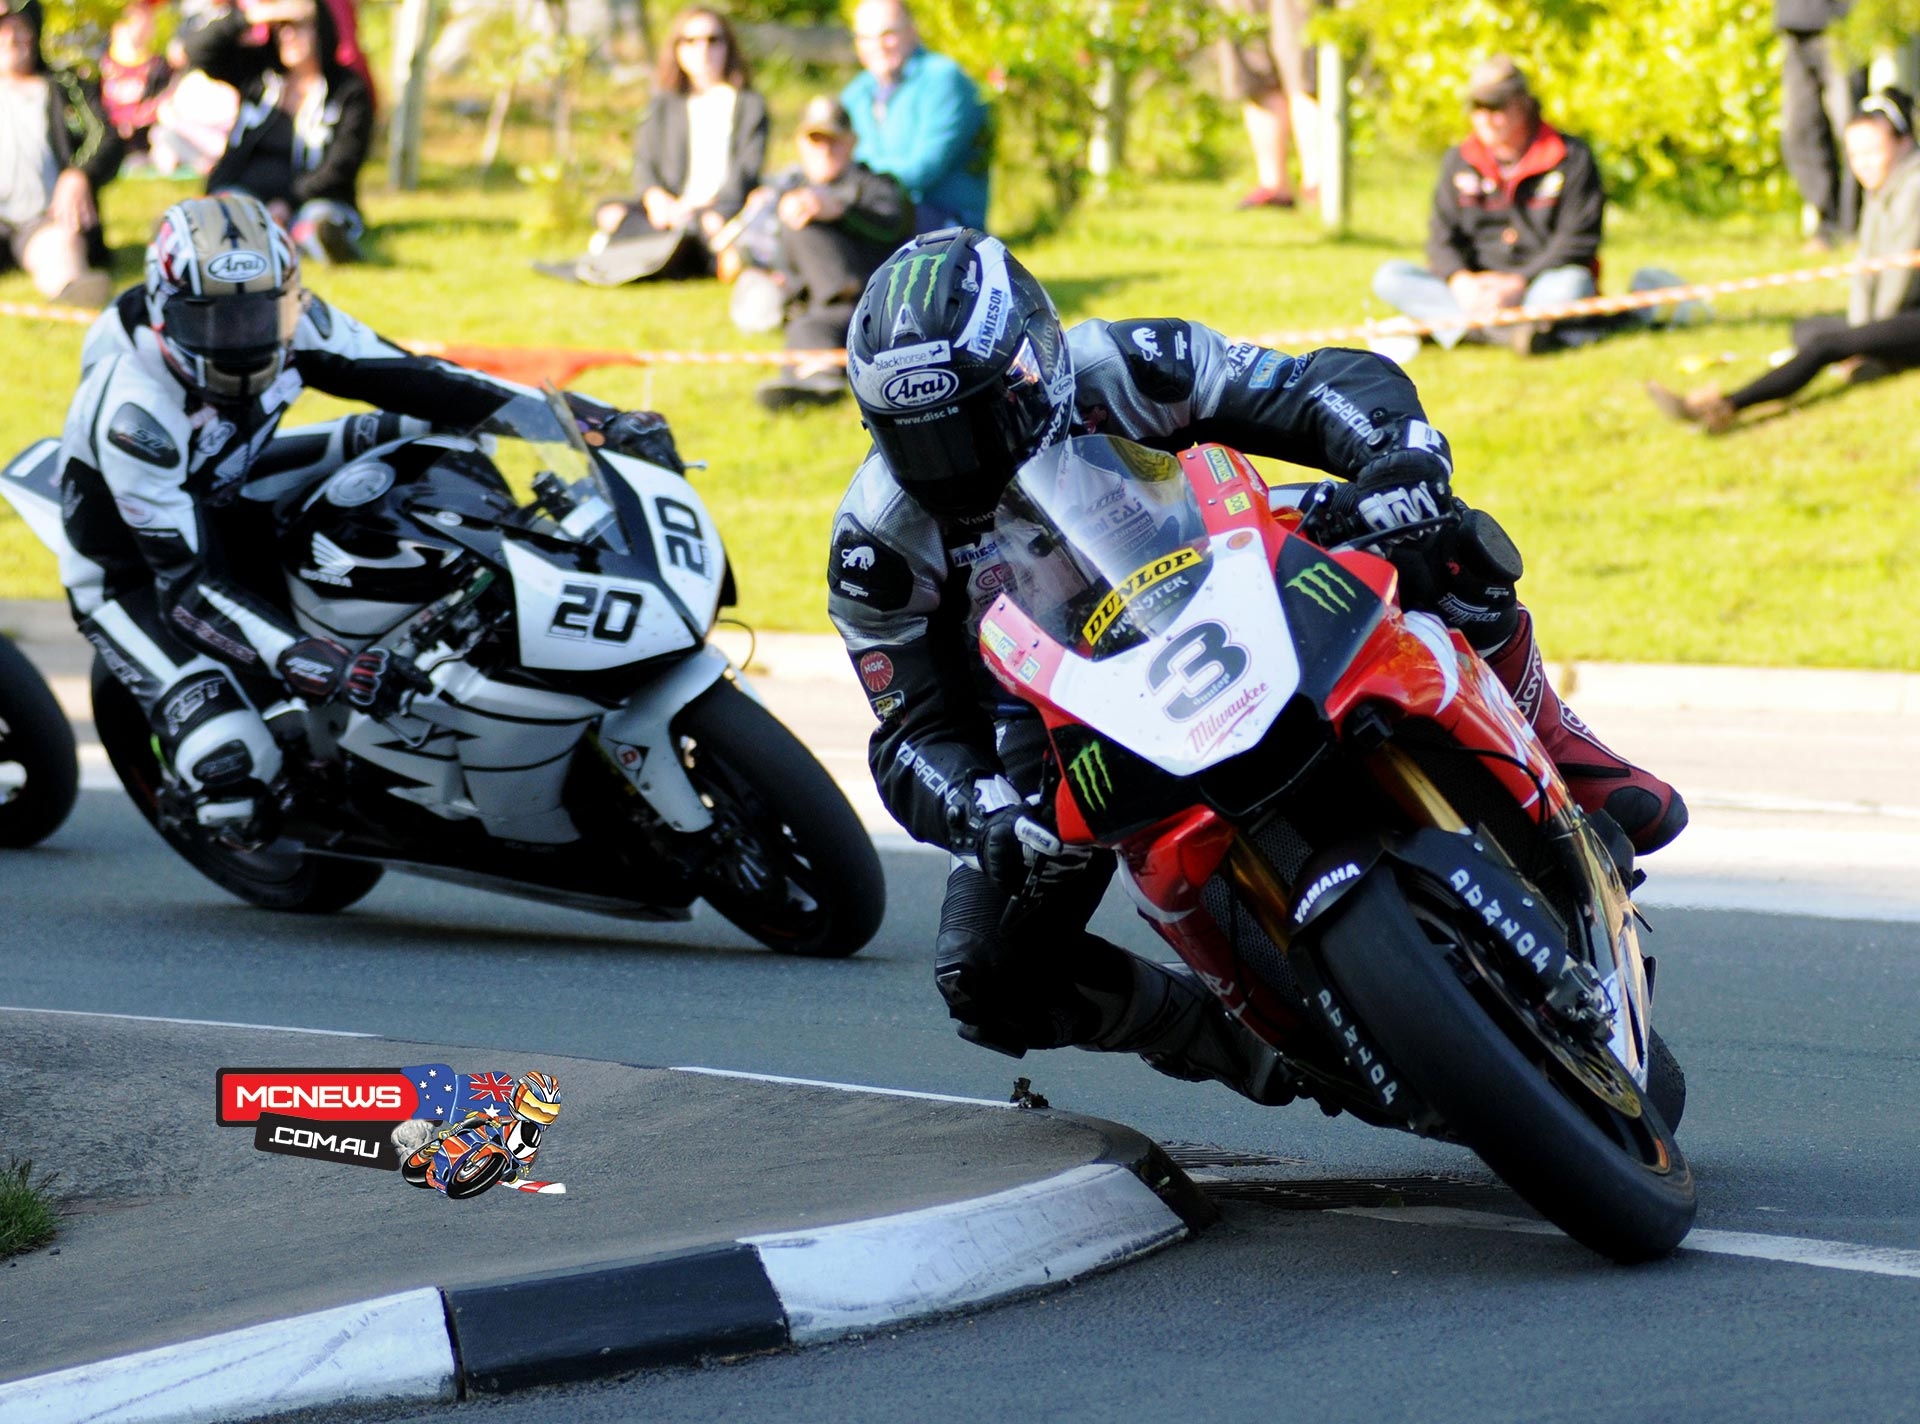 Isle of Man TT 2015 - Practice - Michael Dunlop - Yamaha